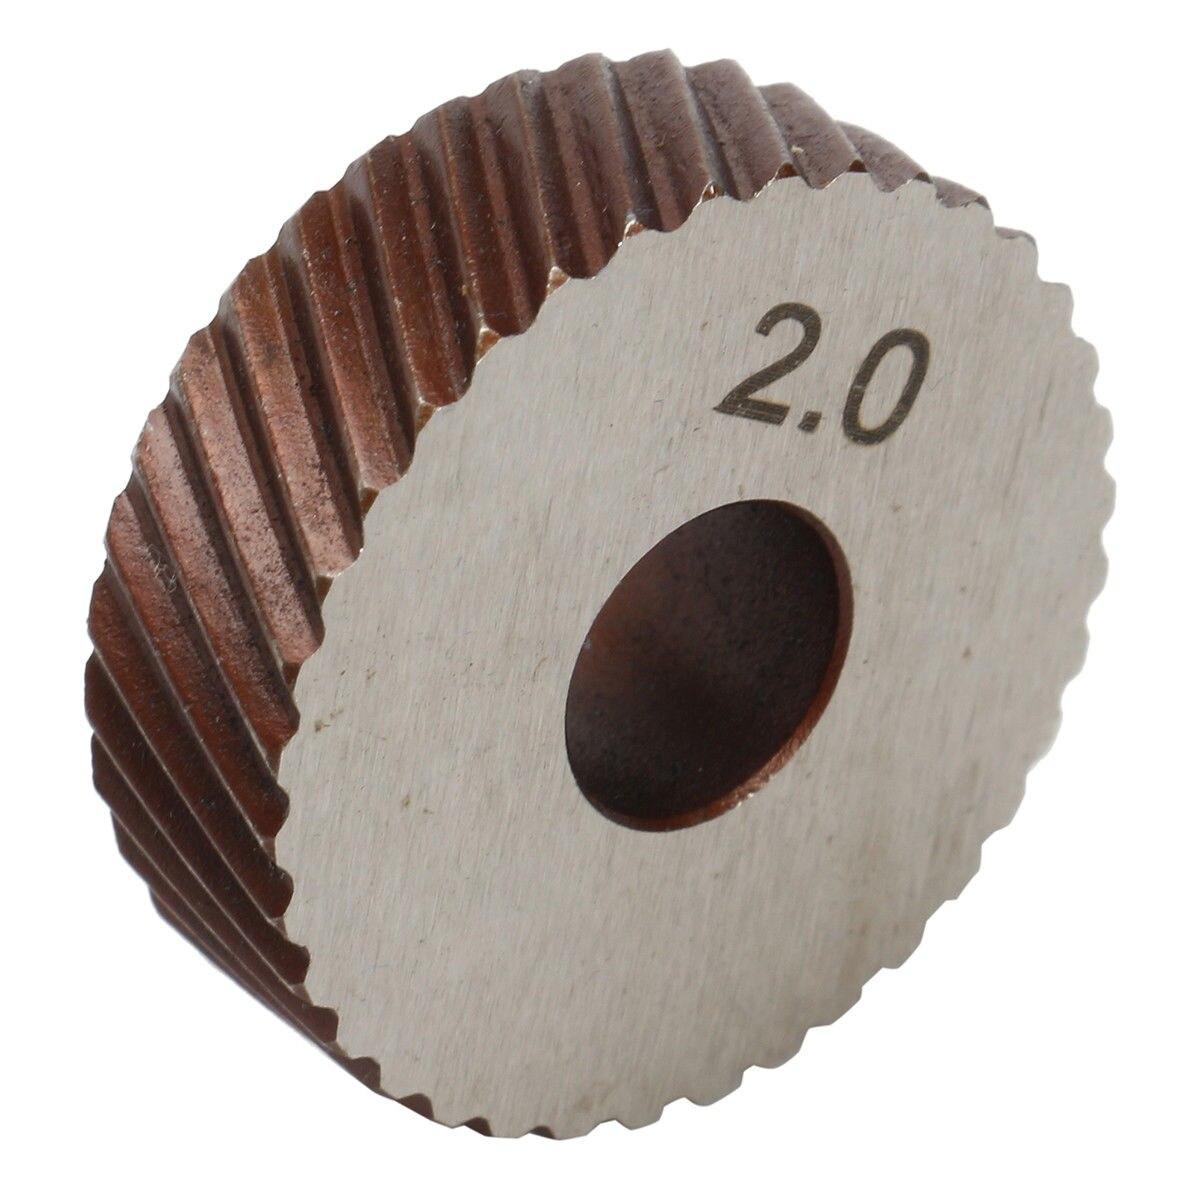 26mm Knurling Tool Steel Dia Dual/Single Wheels Linear Pitch Knurl Set Lathe Cutter Machine Tools 0.6mm-3.0mm